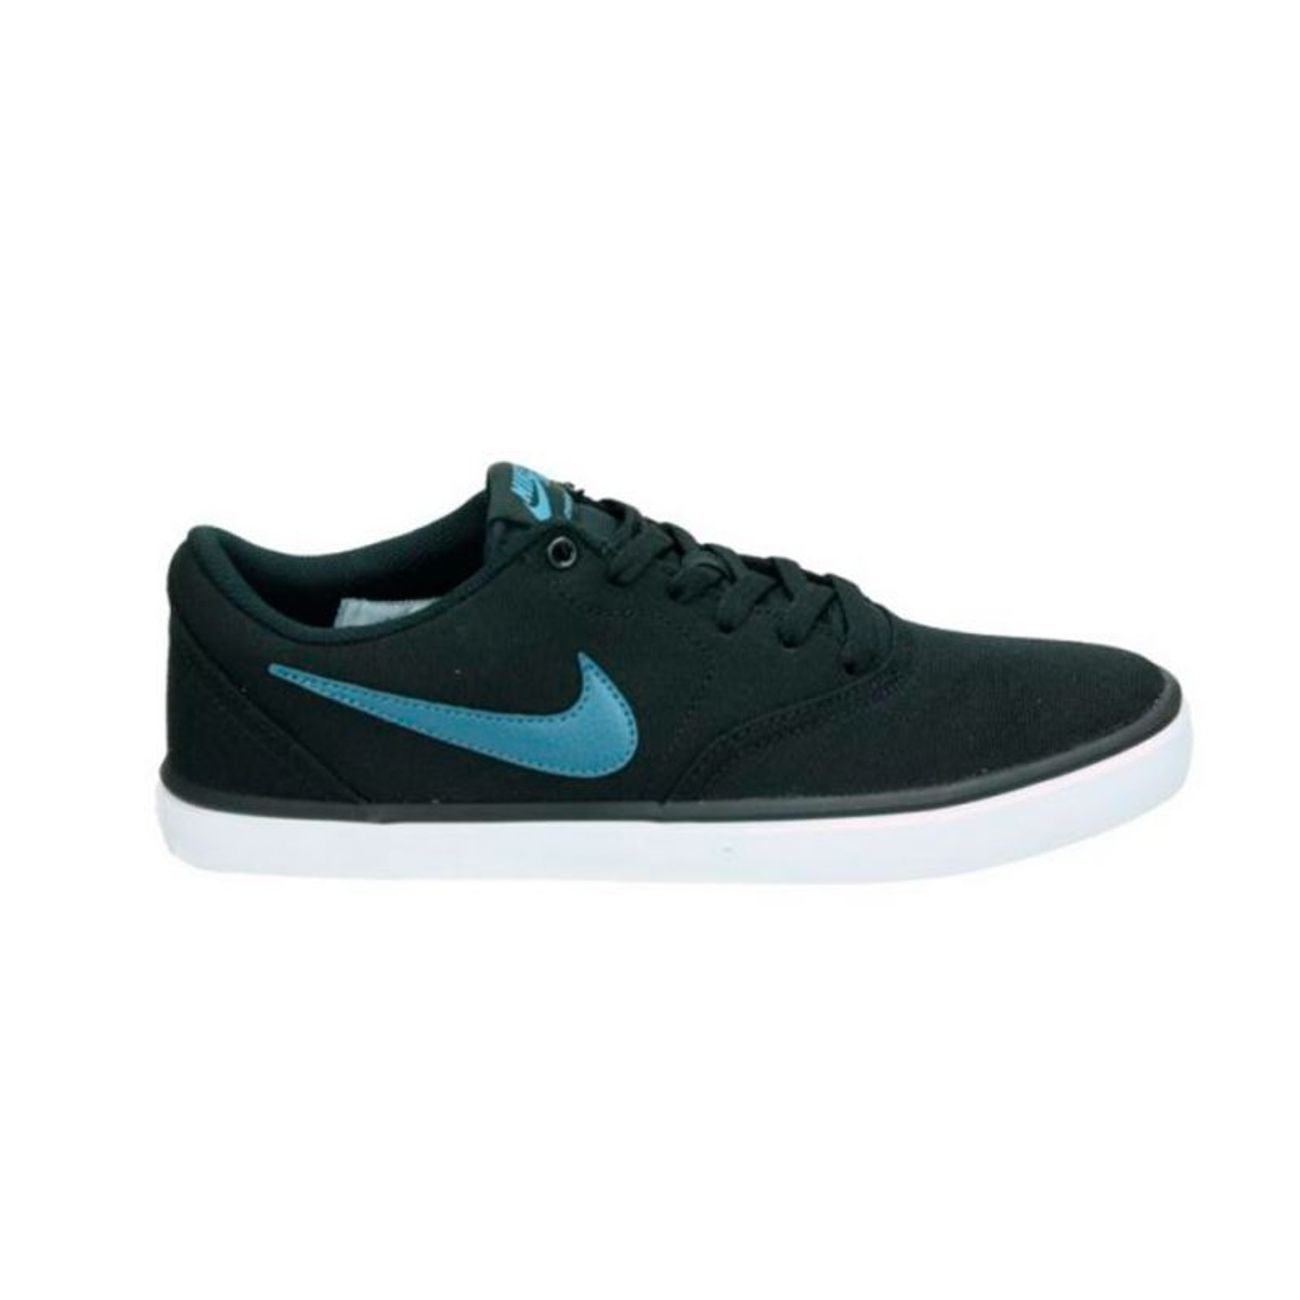 Padel Canvas Ni843896 Nike Noir Bleu Solar Sb 017 Adulte Check pGqUzMSV